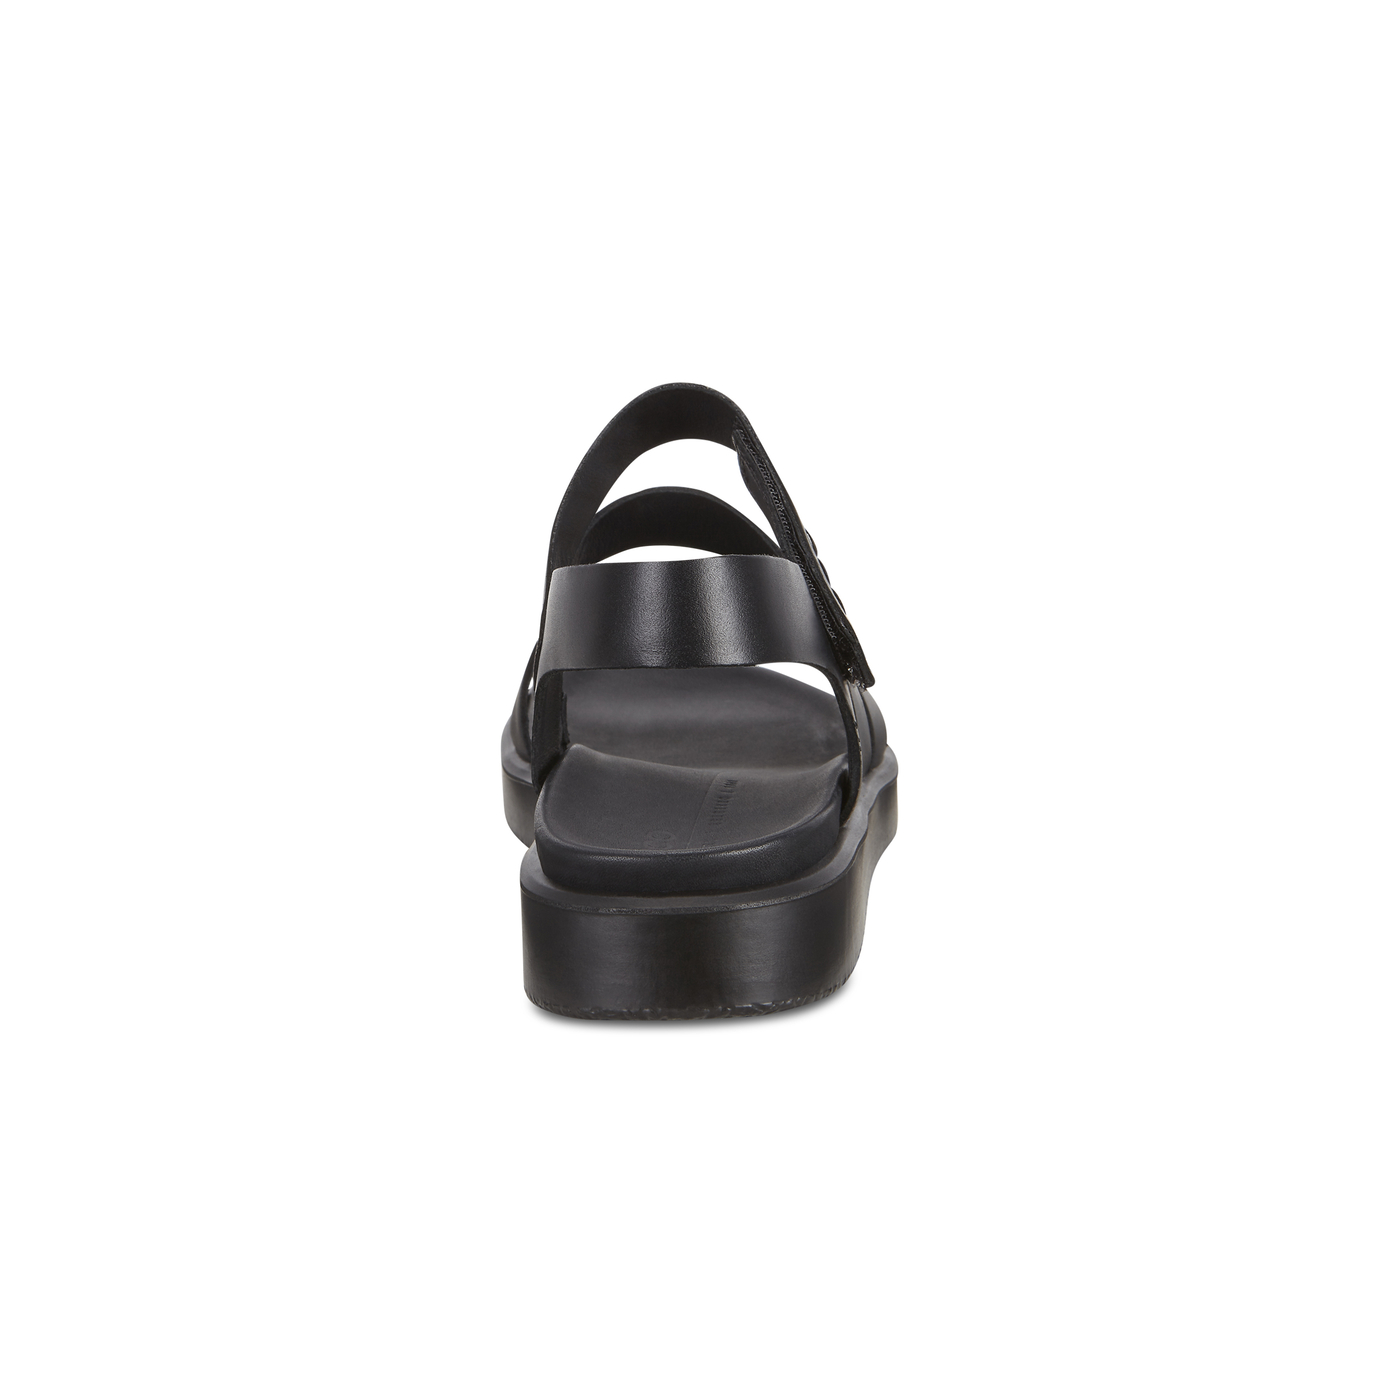 ECCO FLOWT LX Womens Gradiator Sandal